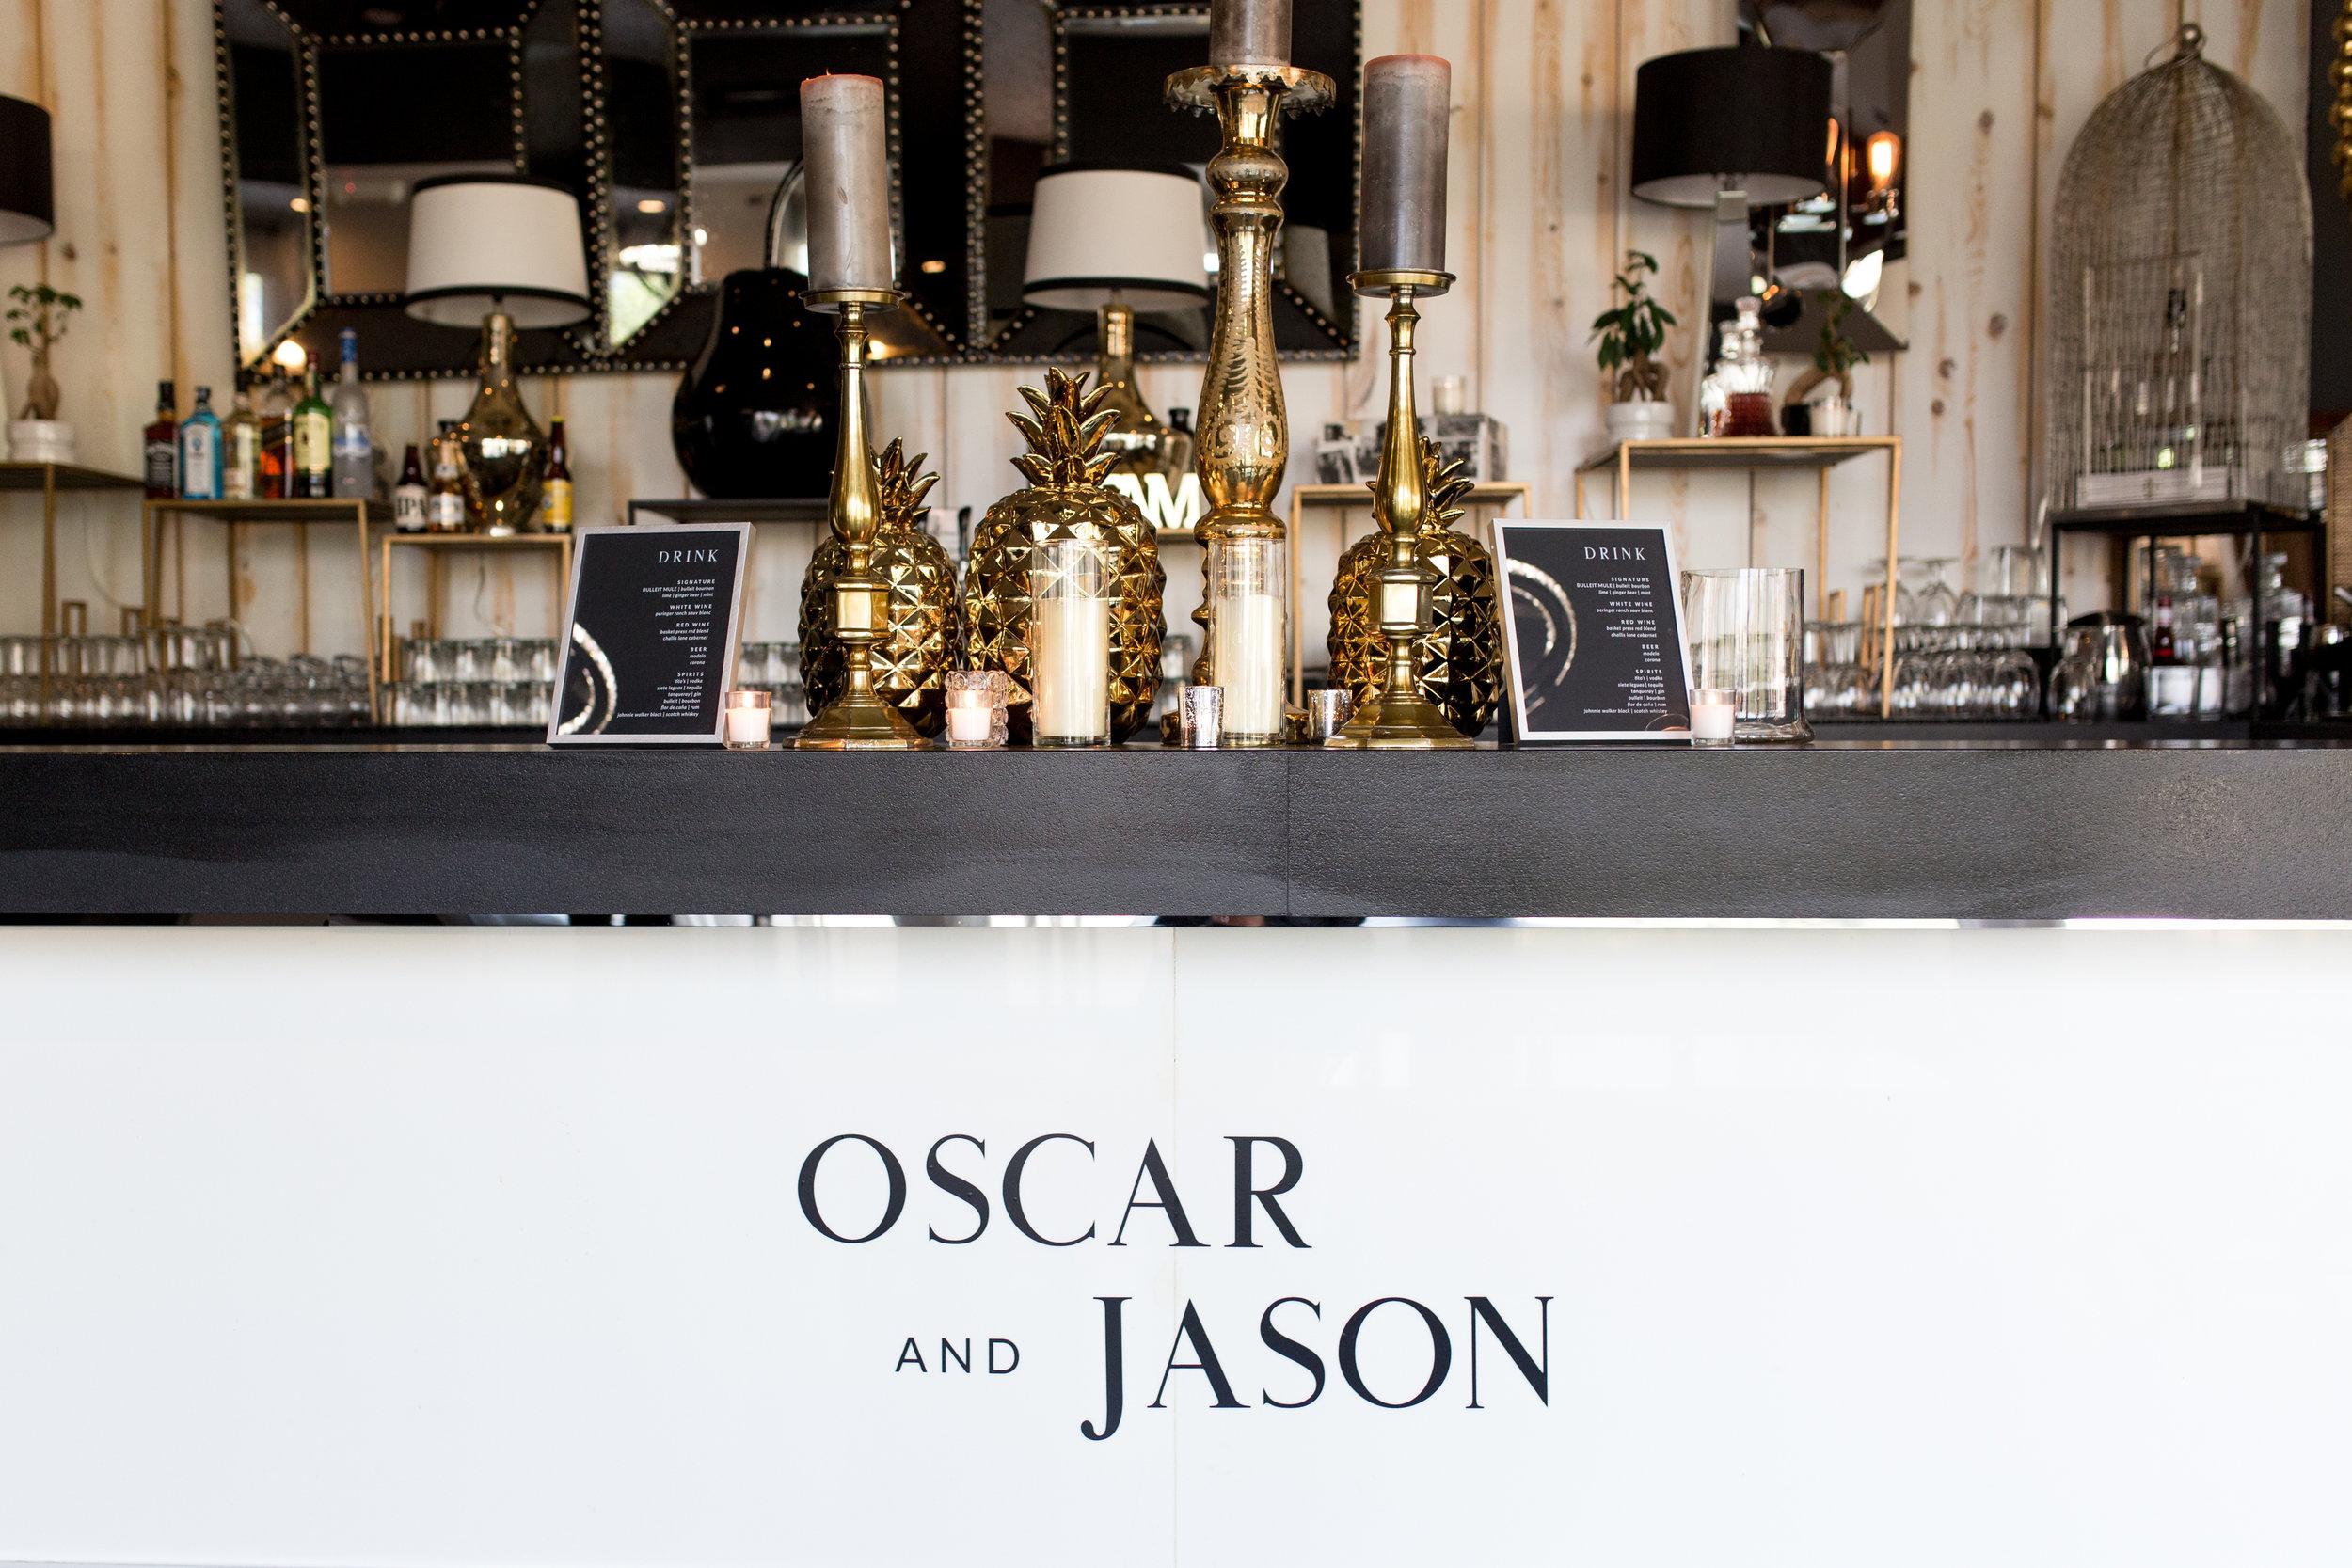 Oscar&Jason_Wedding11.03.17_MichelleKylePhotography-13.jpg